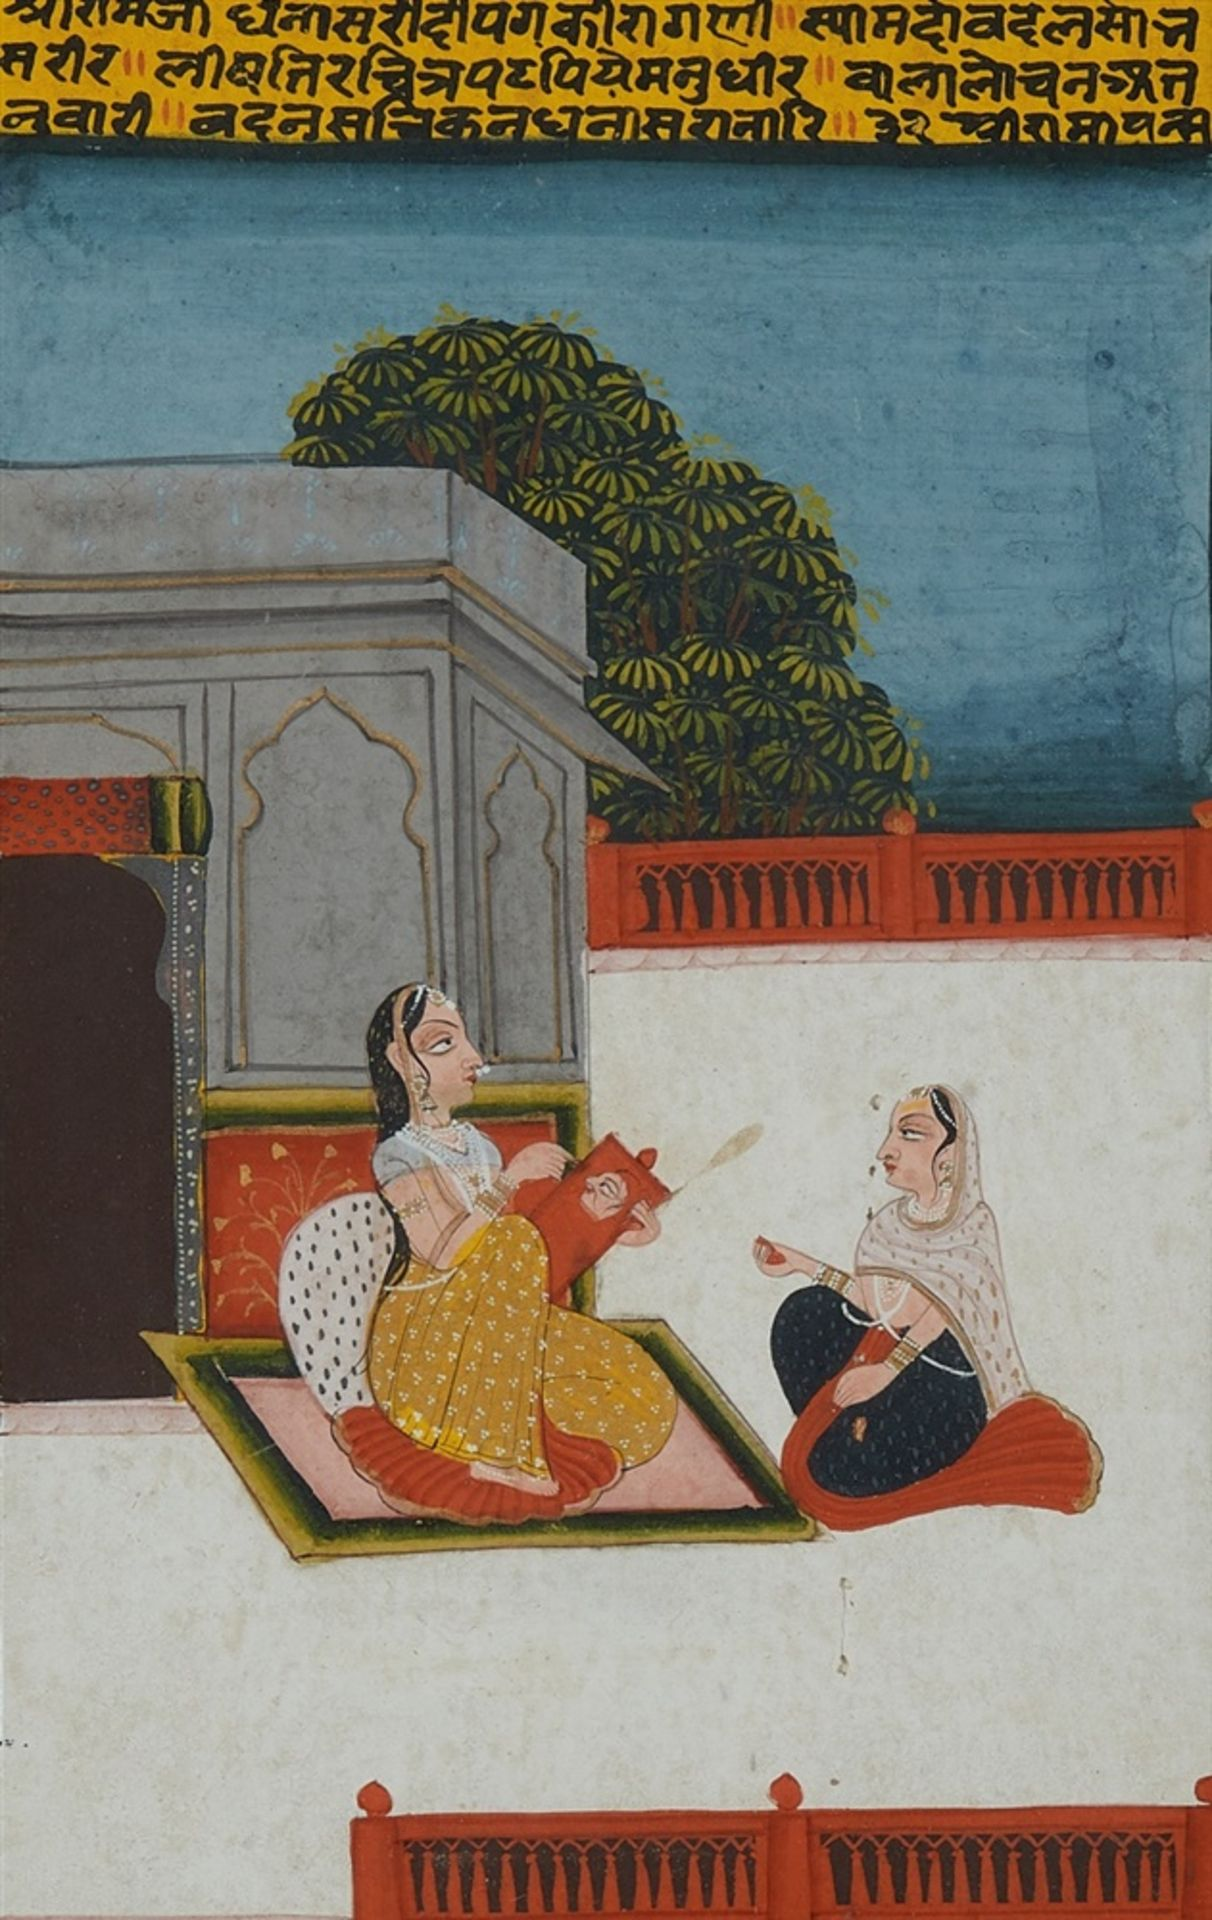 Anonyme Maler. Jaipur. Spätes 18./19. Jh.